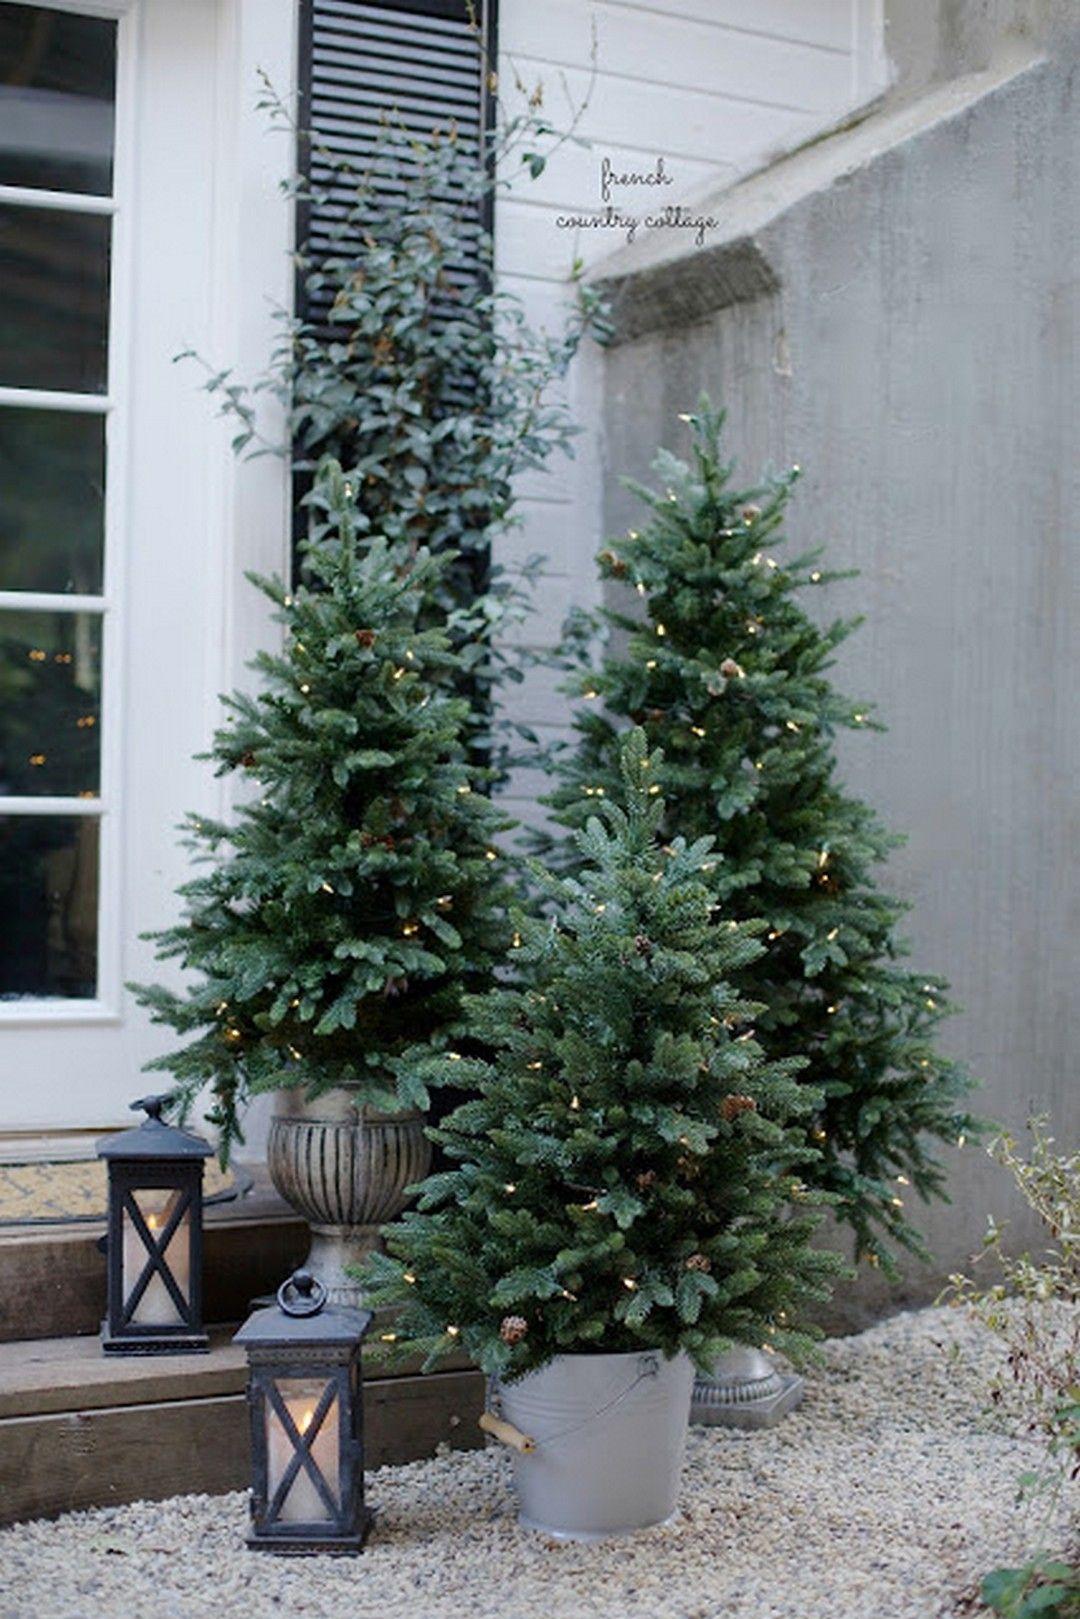 32 easy diy outdoor christmas lighting hacks httpswwwonechitecturecom2017102732 easy diy outdoor christmas lighting hacks - Diy Outdoor Christmas Decorations Pinterest